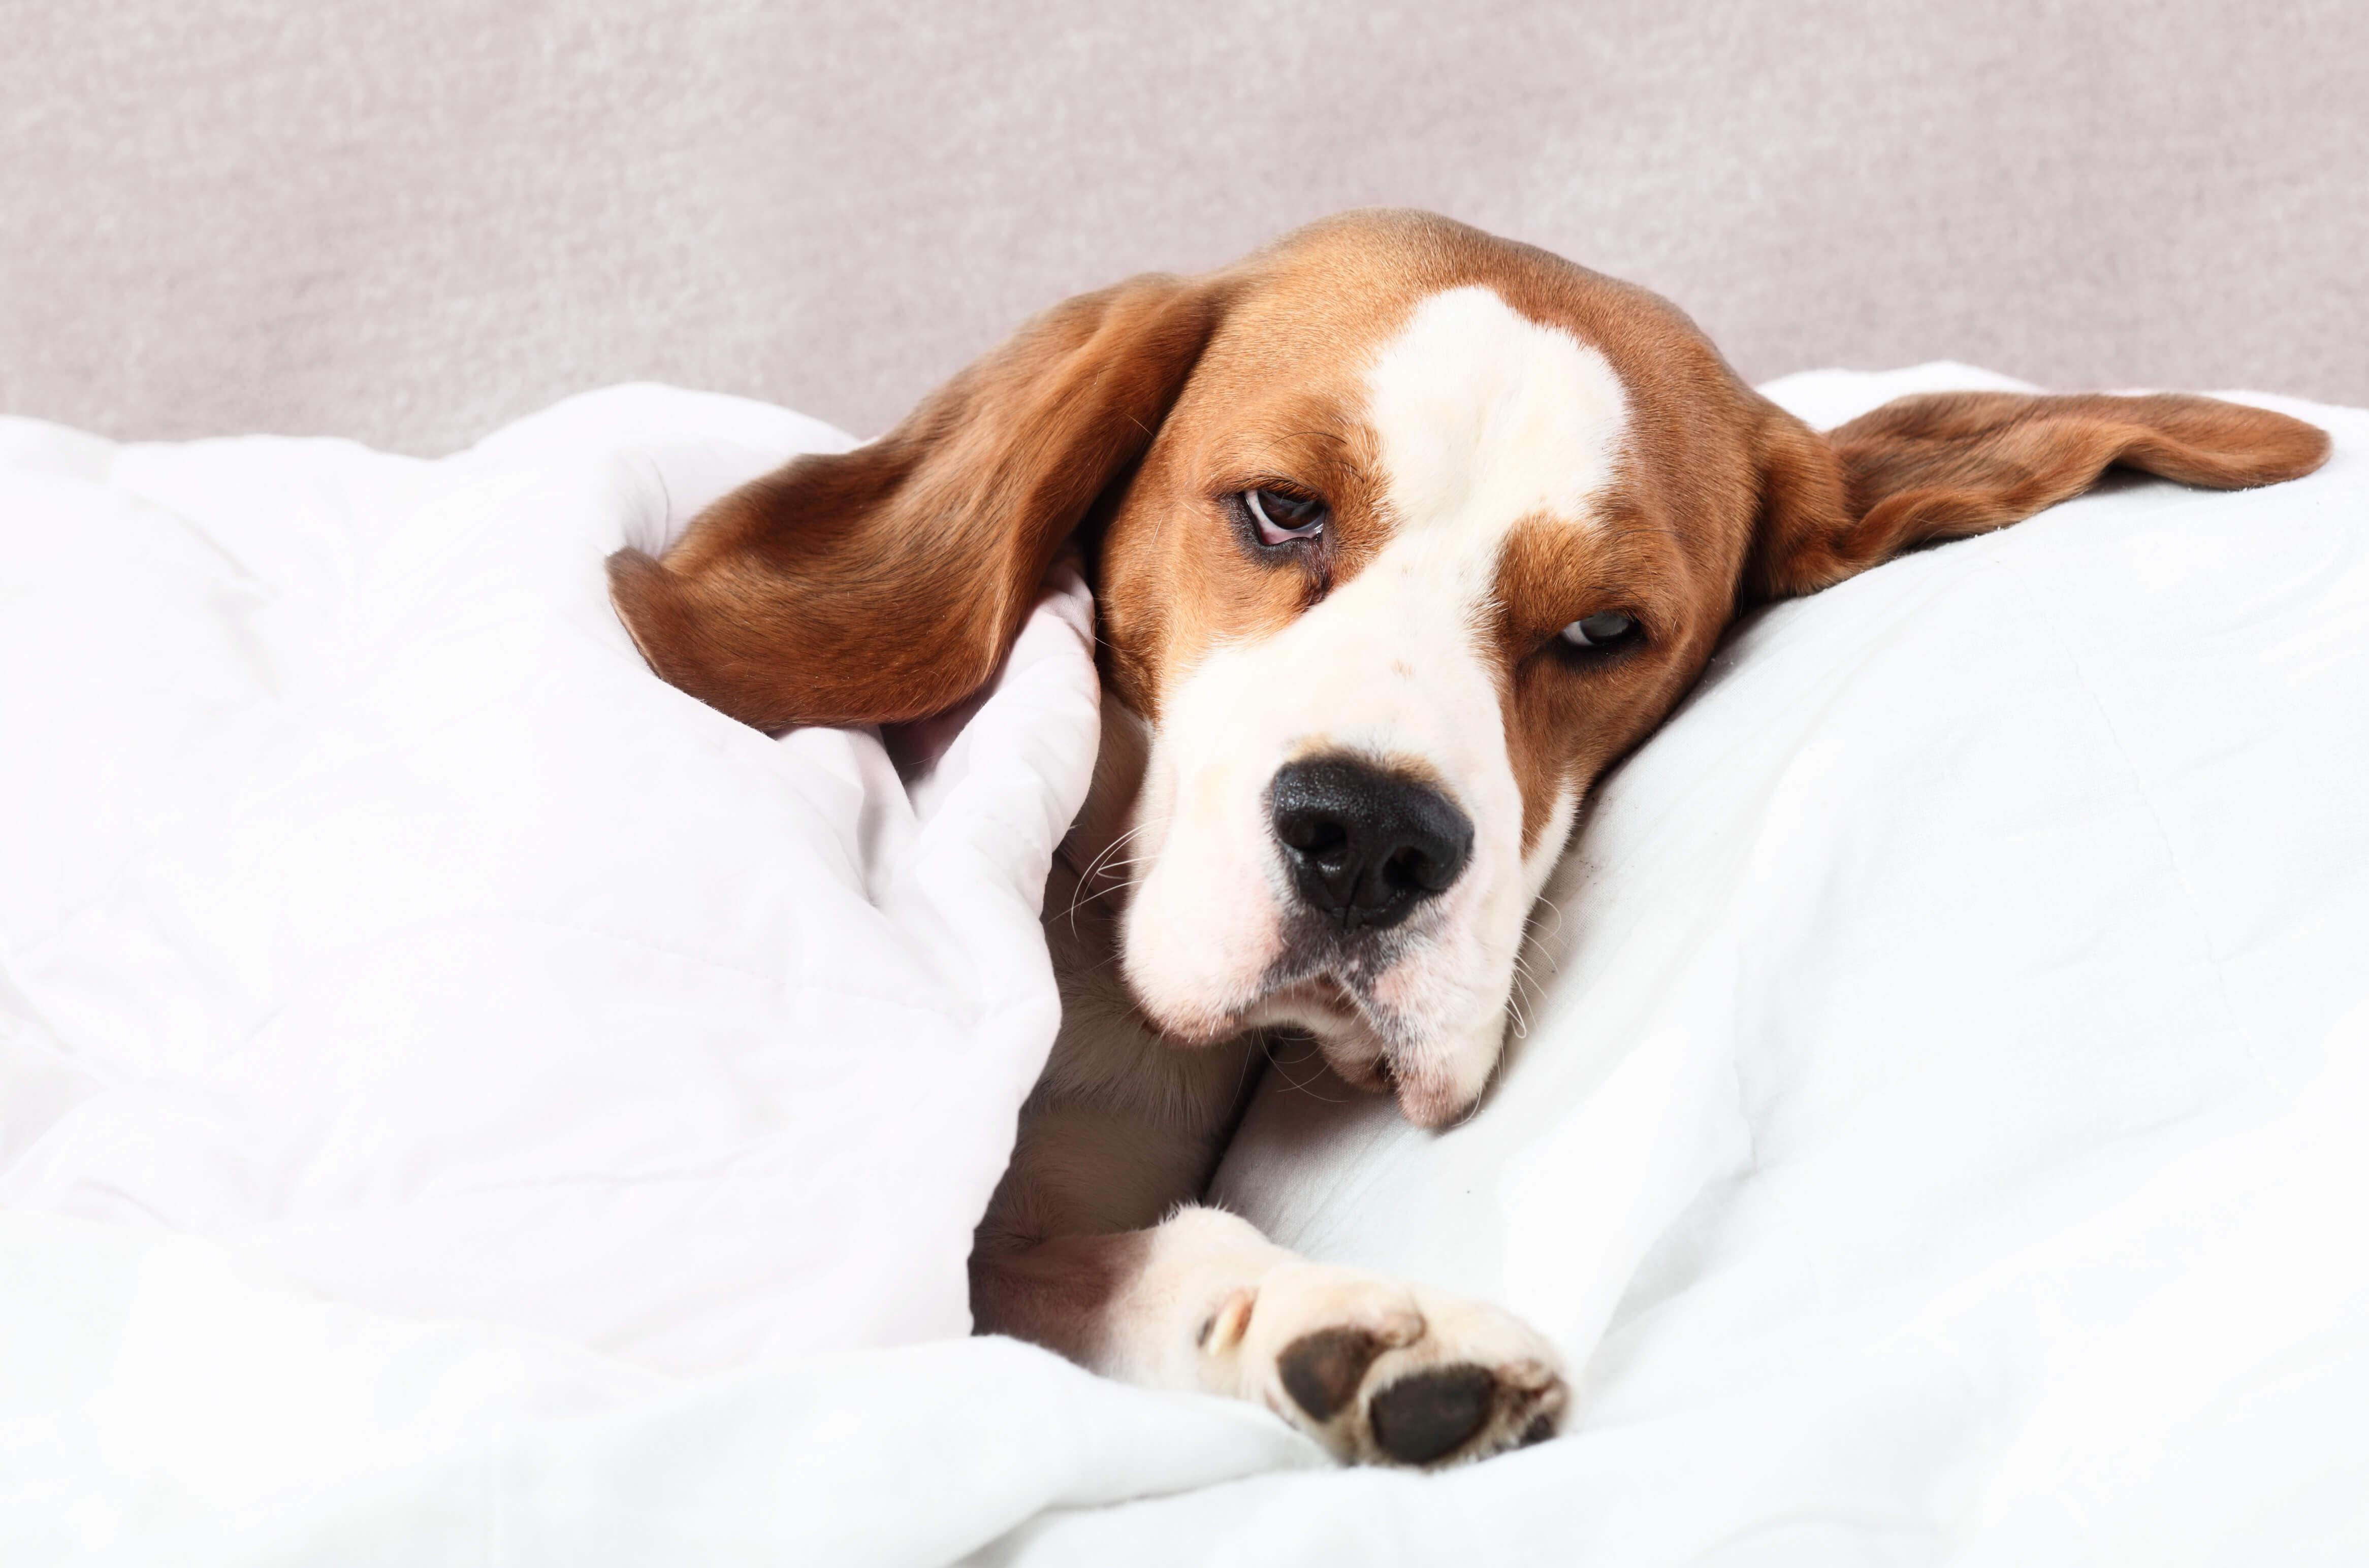 sedated dog